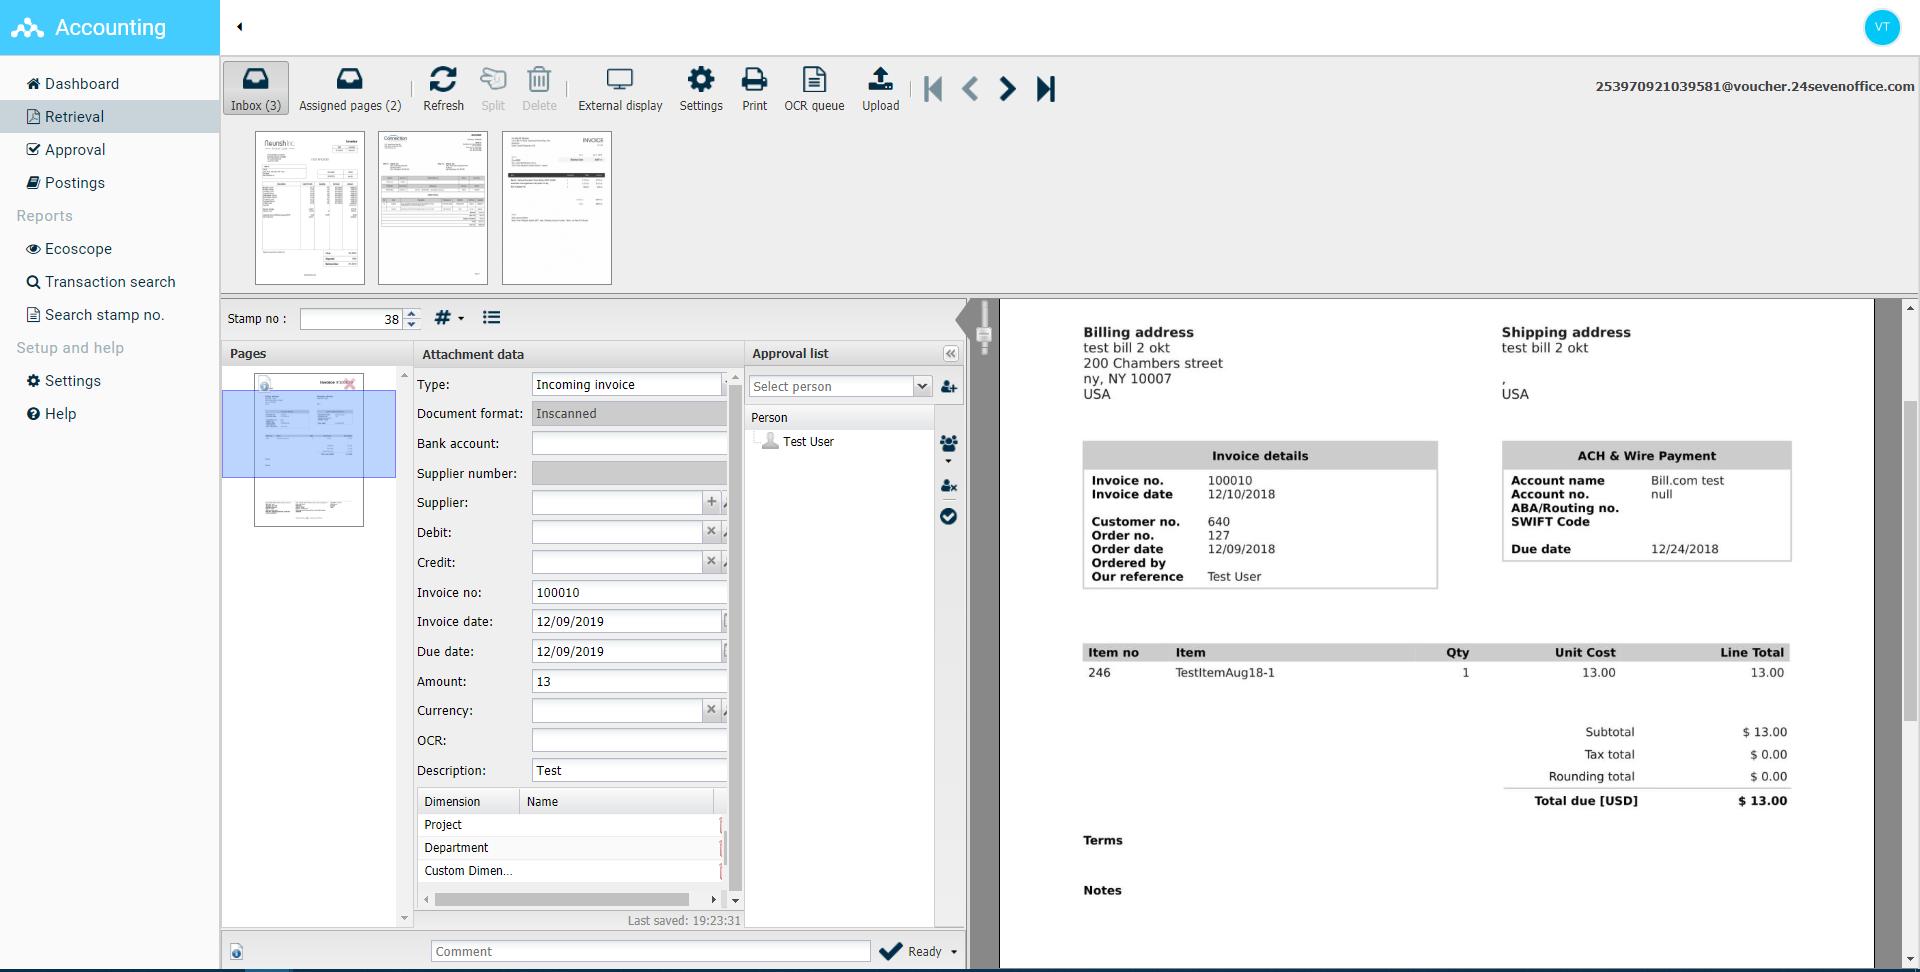 24SevenOffice Software - Invoice viewer